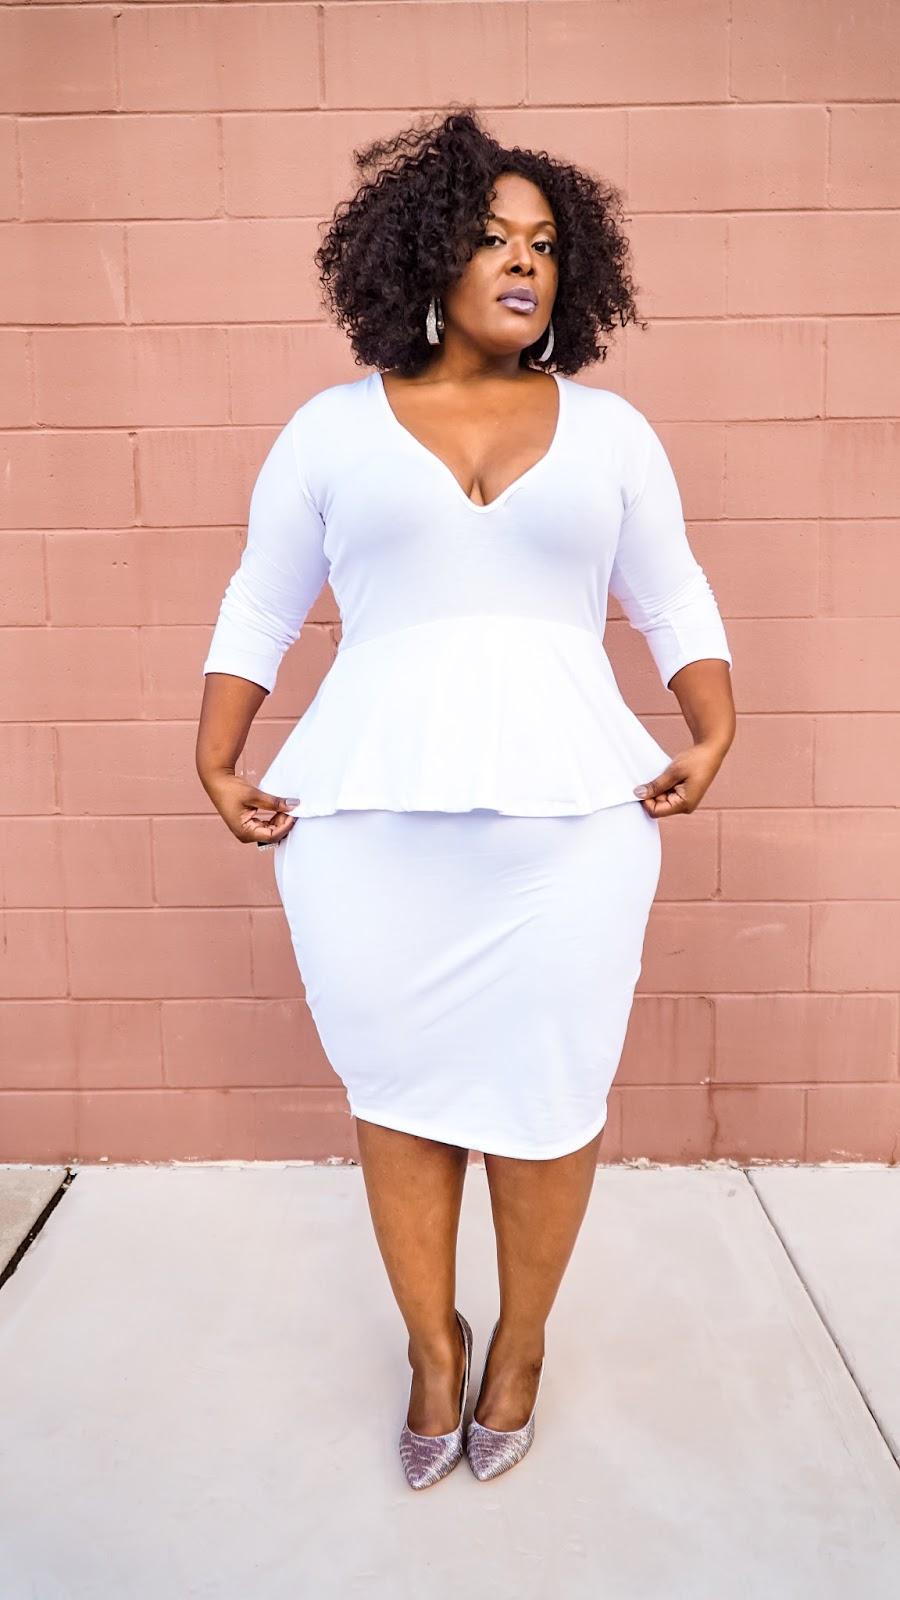 Big Bella Donna Fashion: Winter Whites with Rebdolls \